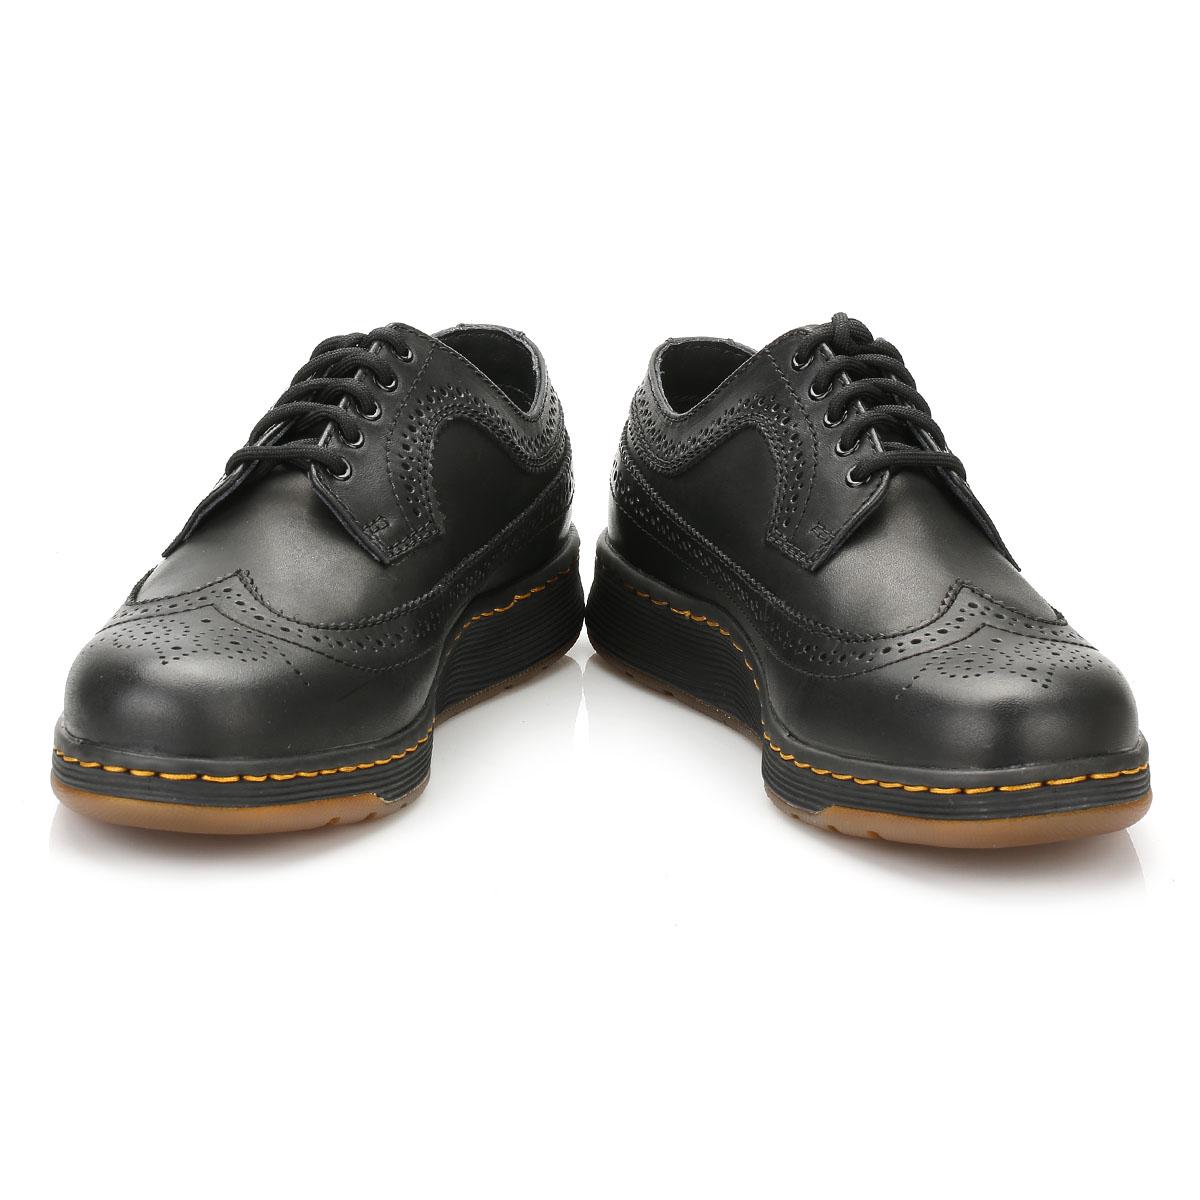 Brogue DrMartens Gabe ZapatosNegro O Título Hombre Wingtip Acerca Detalles RojoCueroCon Original Para Mostrar De CordonesDocs H9eWEDY2I